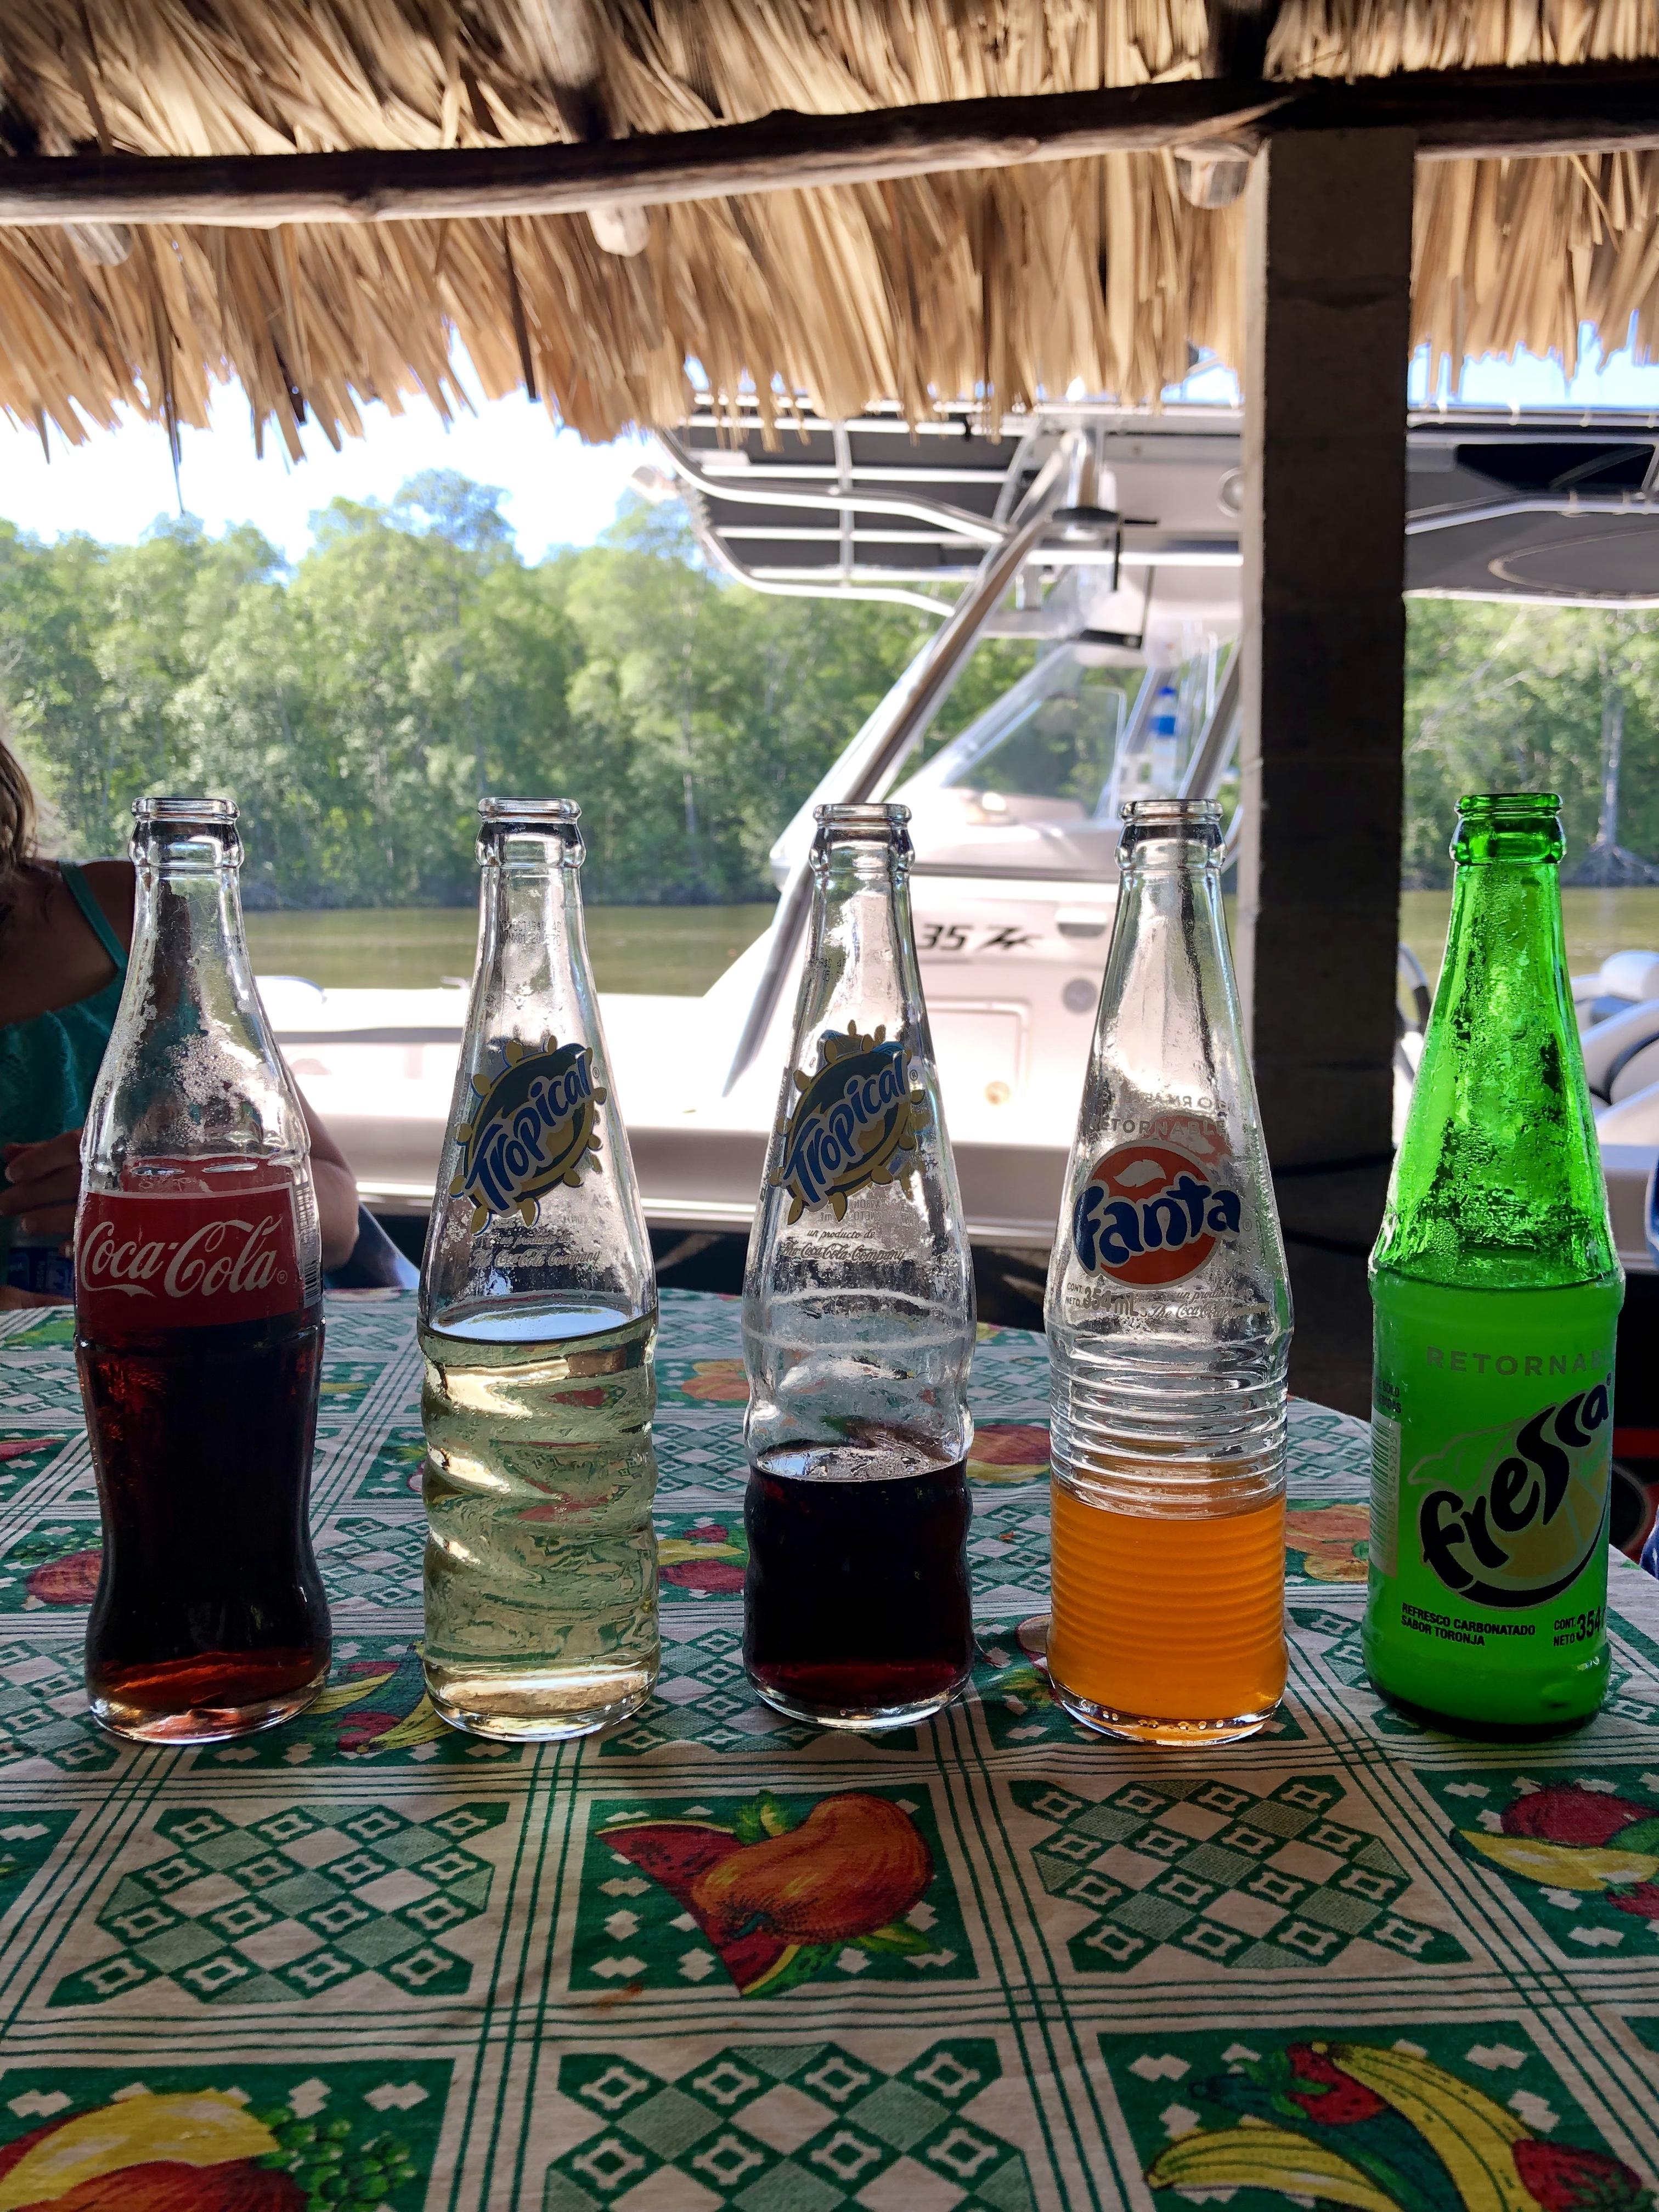 soda bottles sitting on table